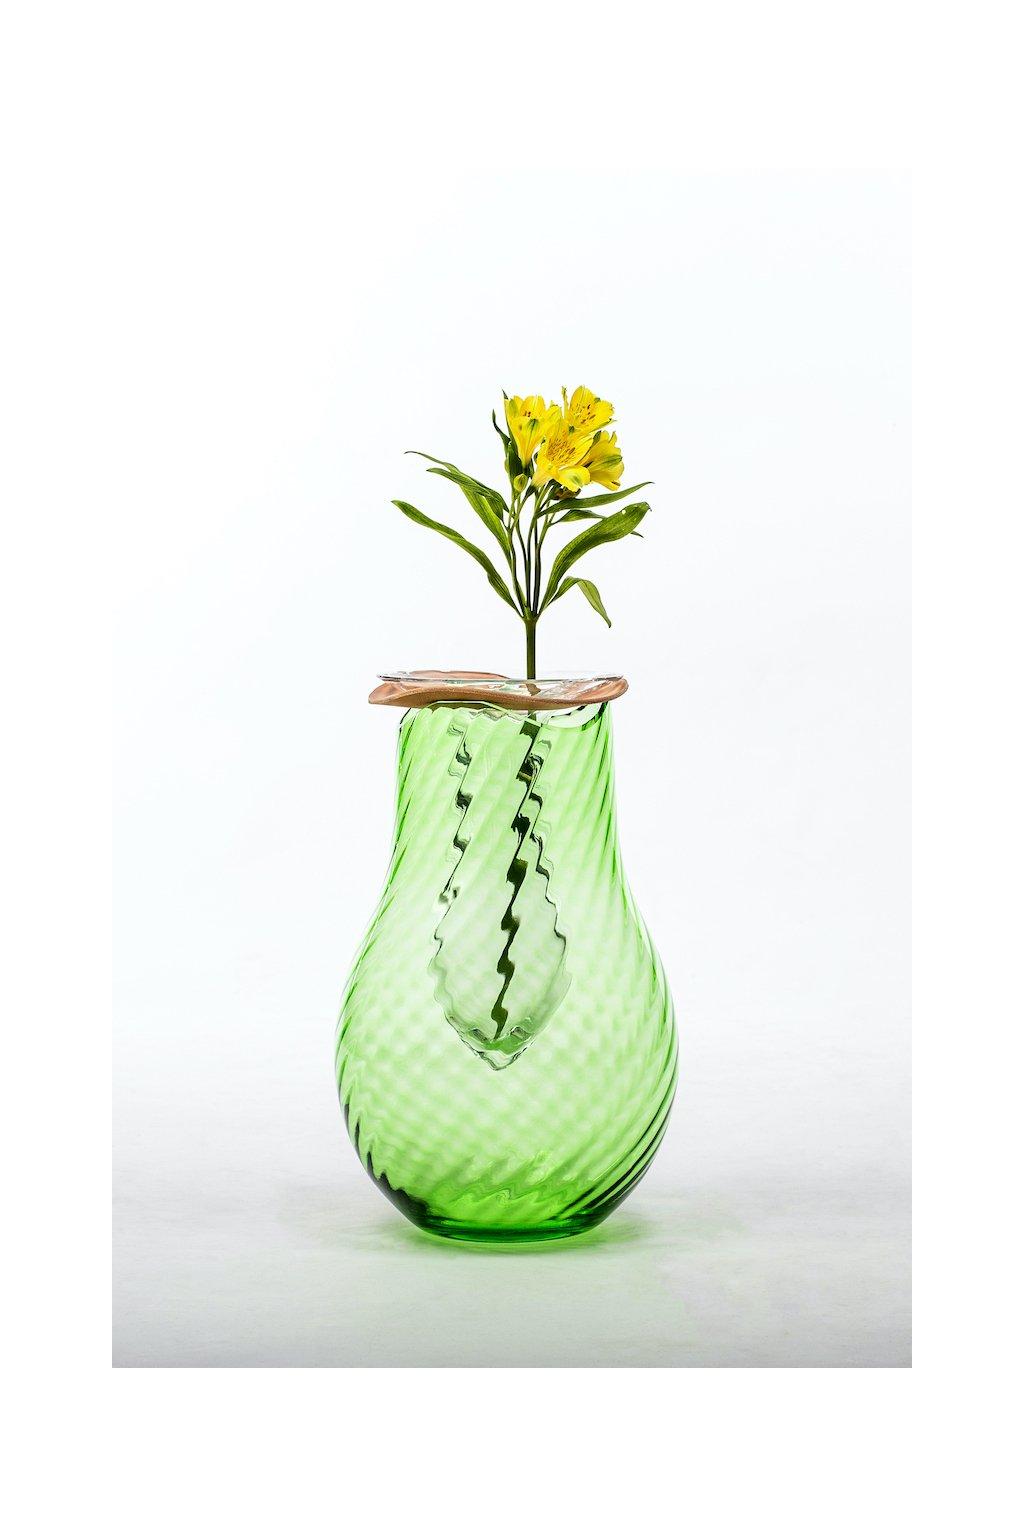 BAREVNAA green